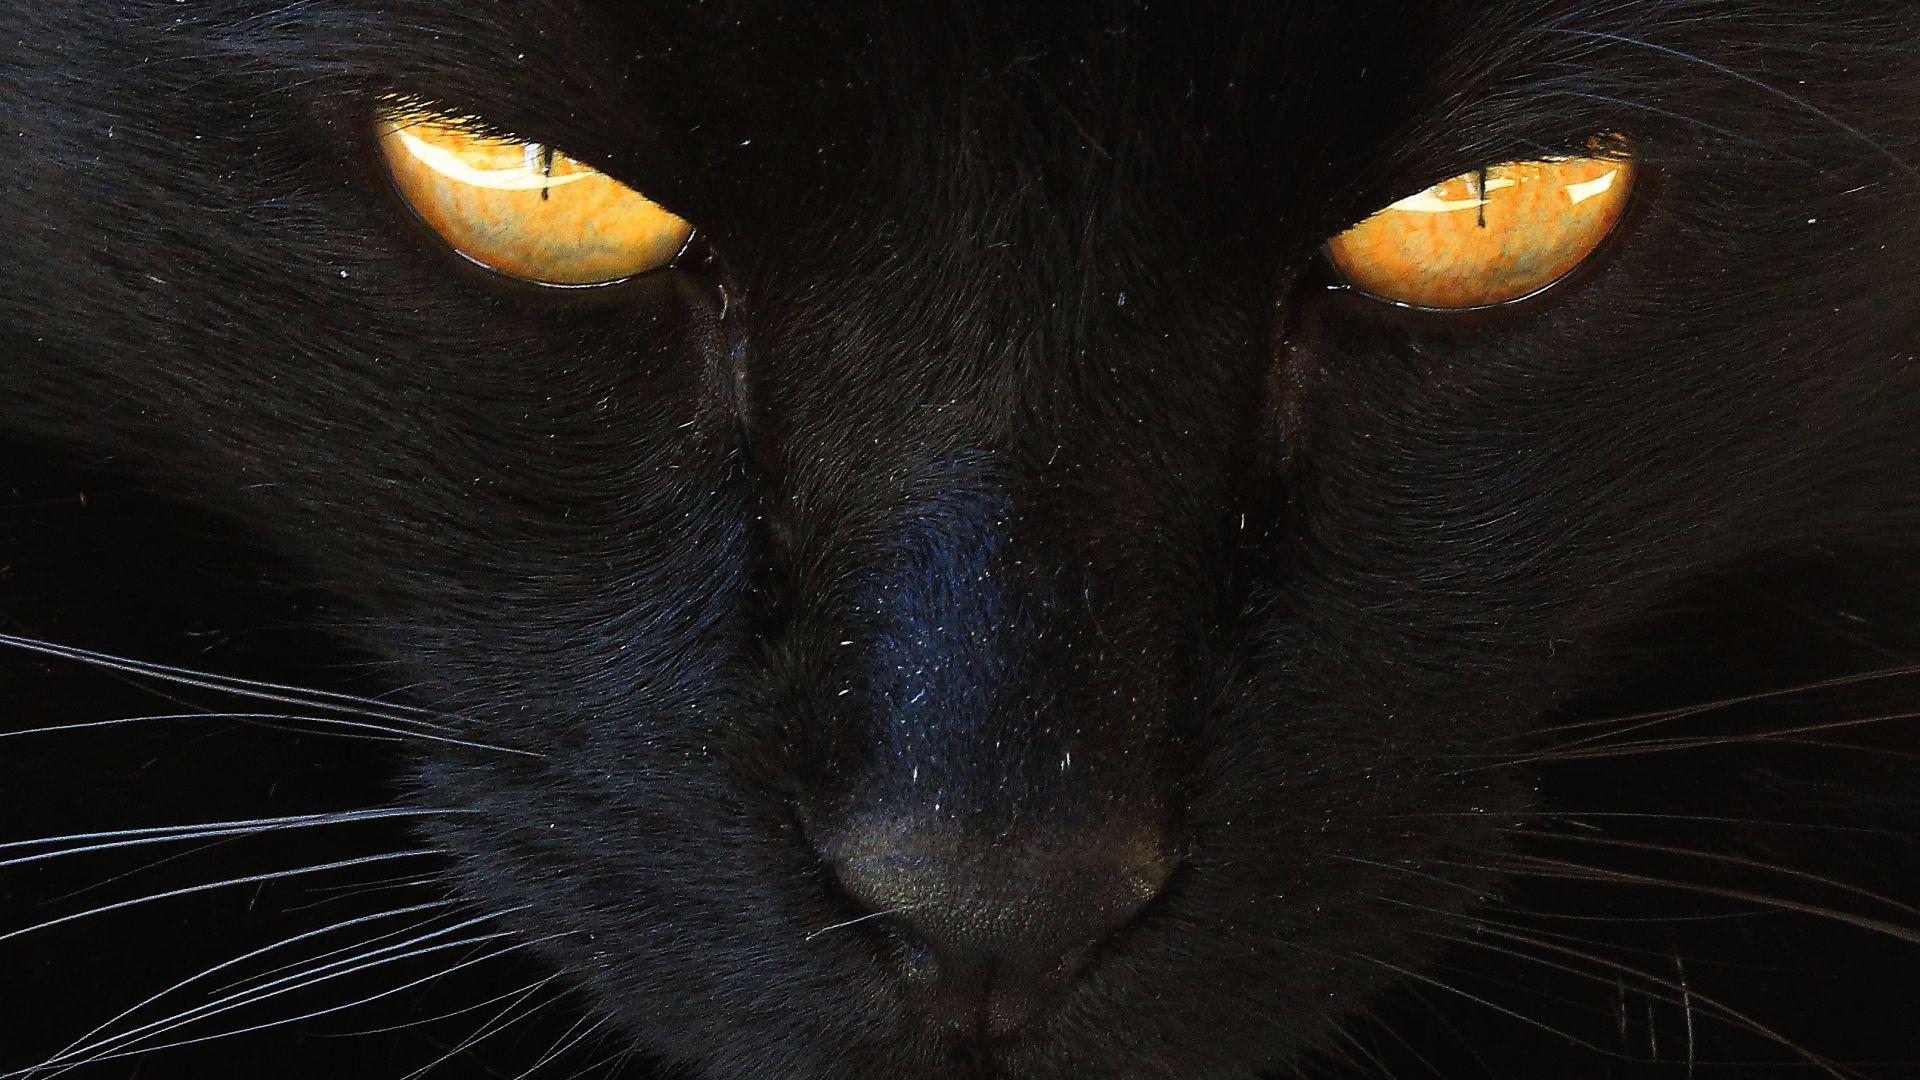 Wallpaper Pet, cat, black animal, eyes, fur, muzzle